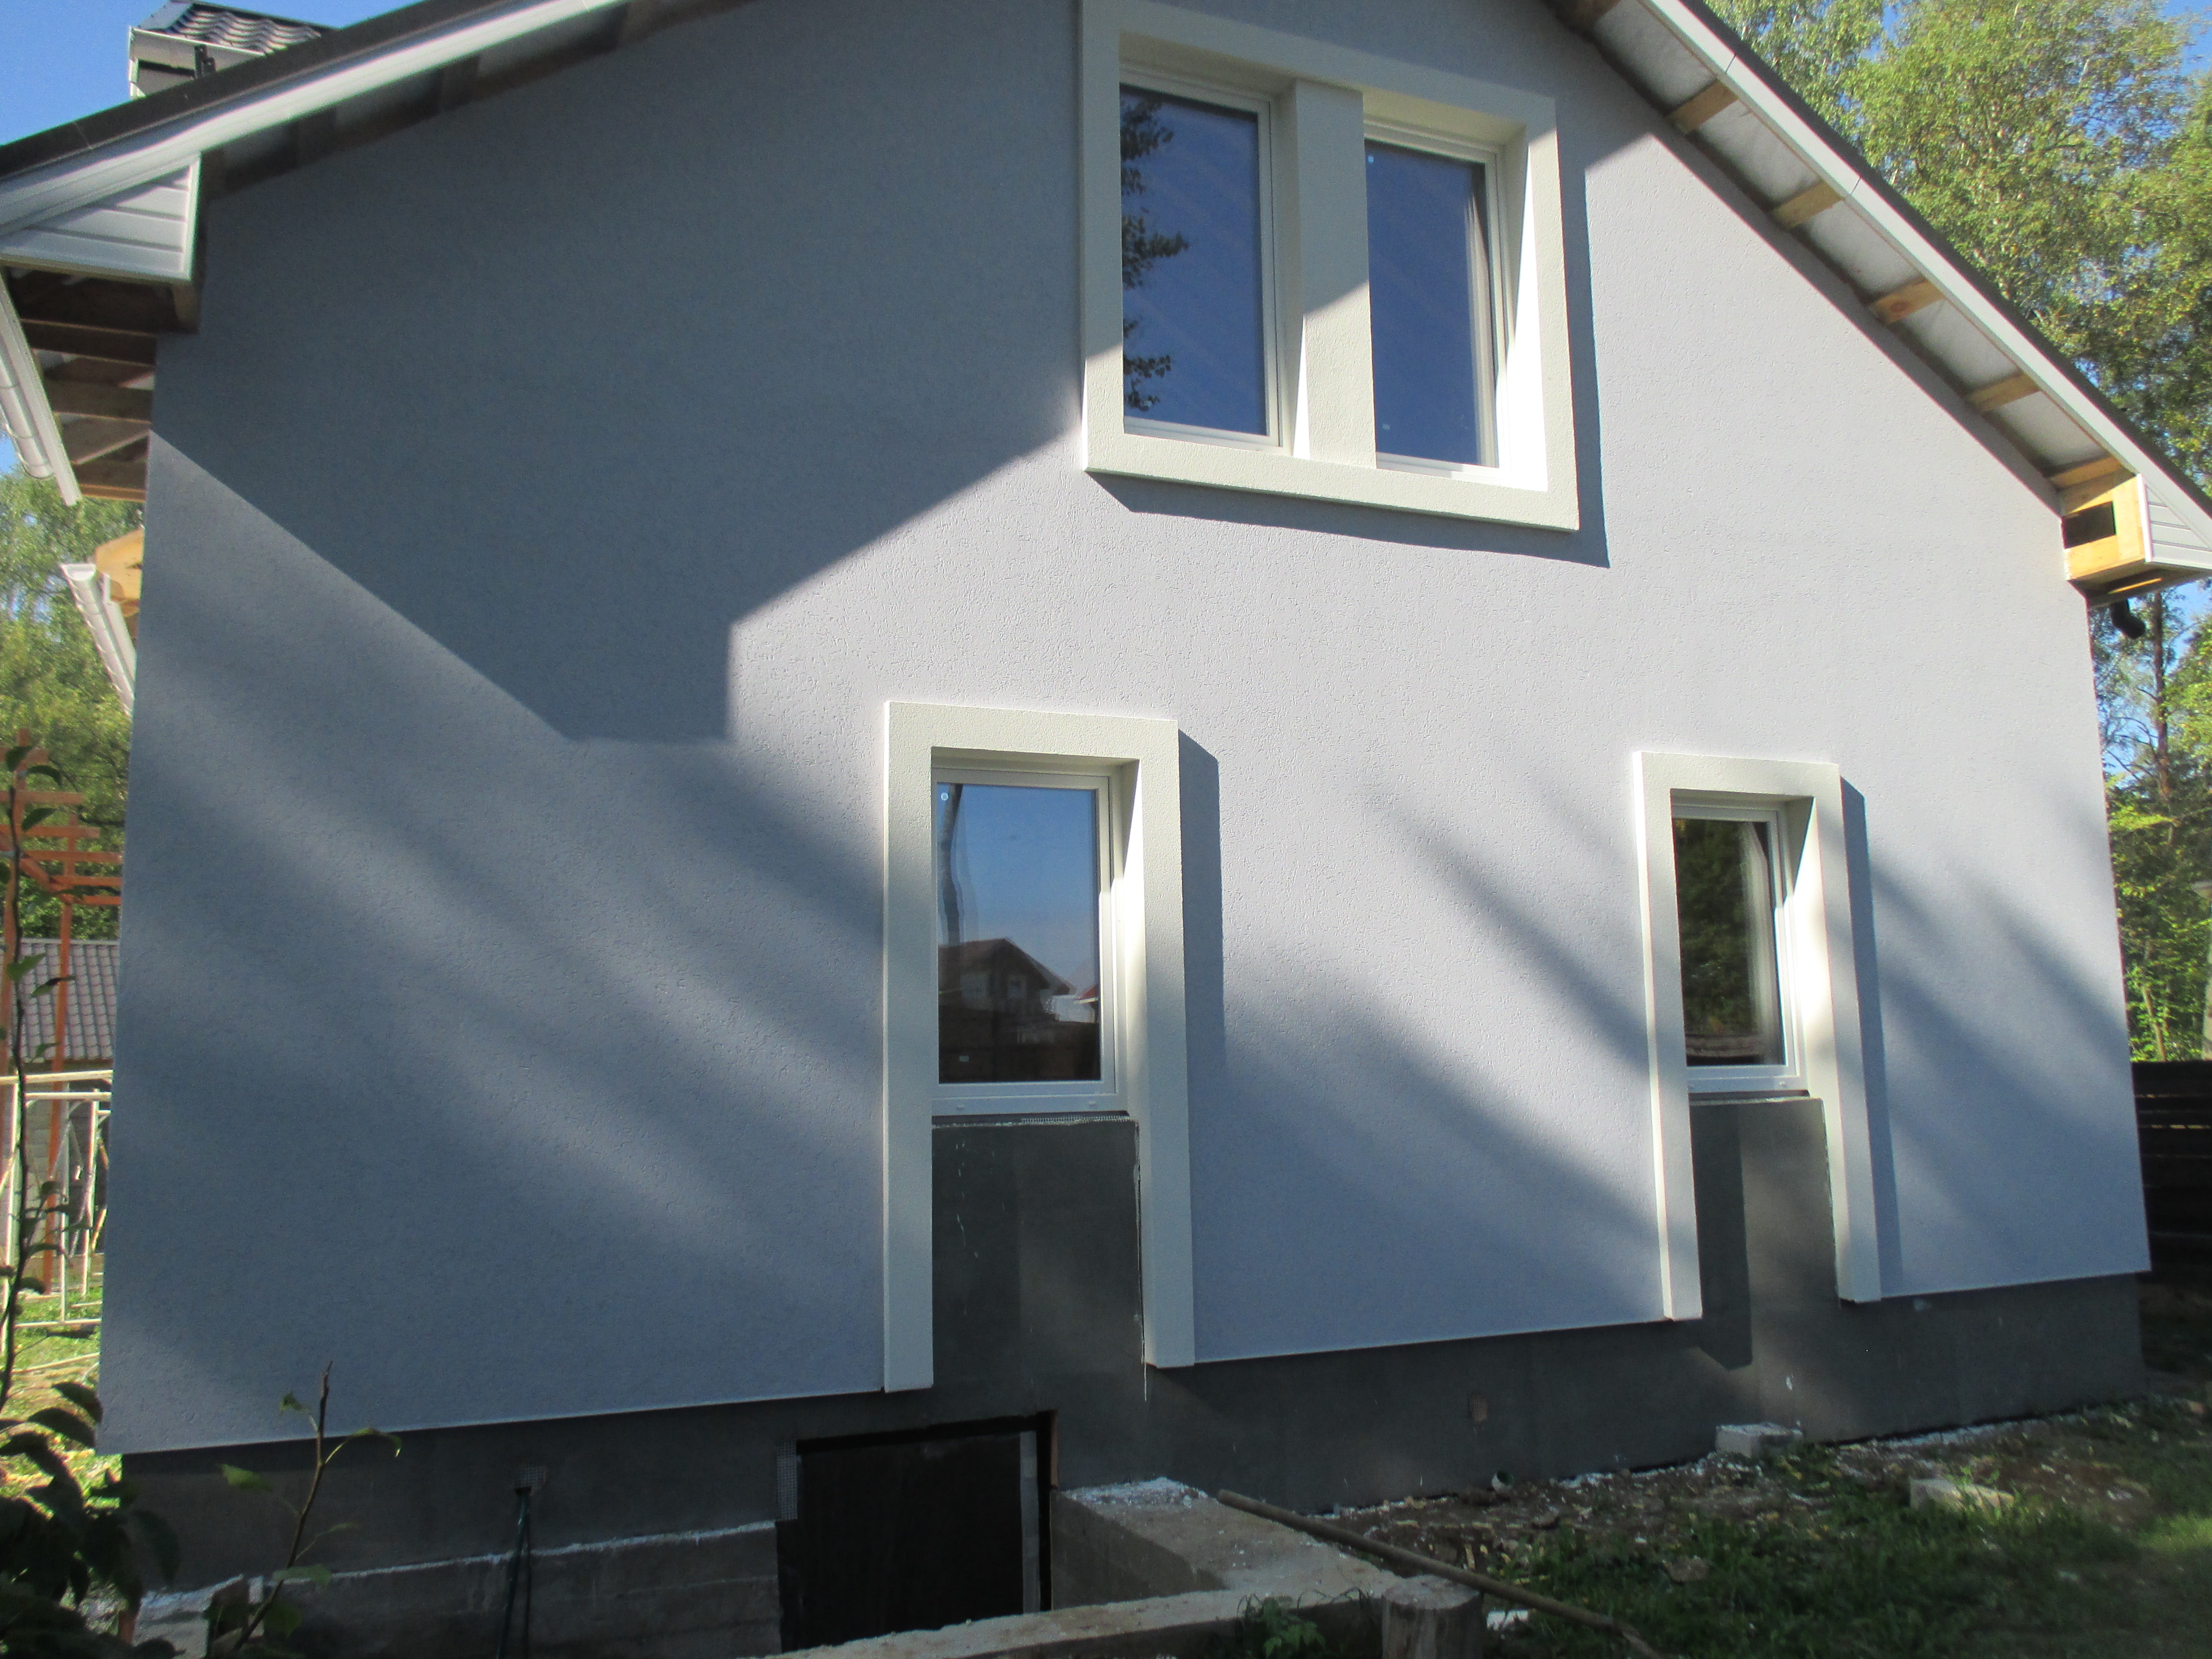 картинки фасада дома пенопласт постоянно